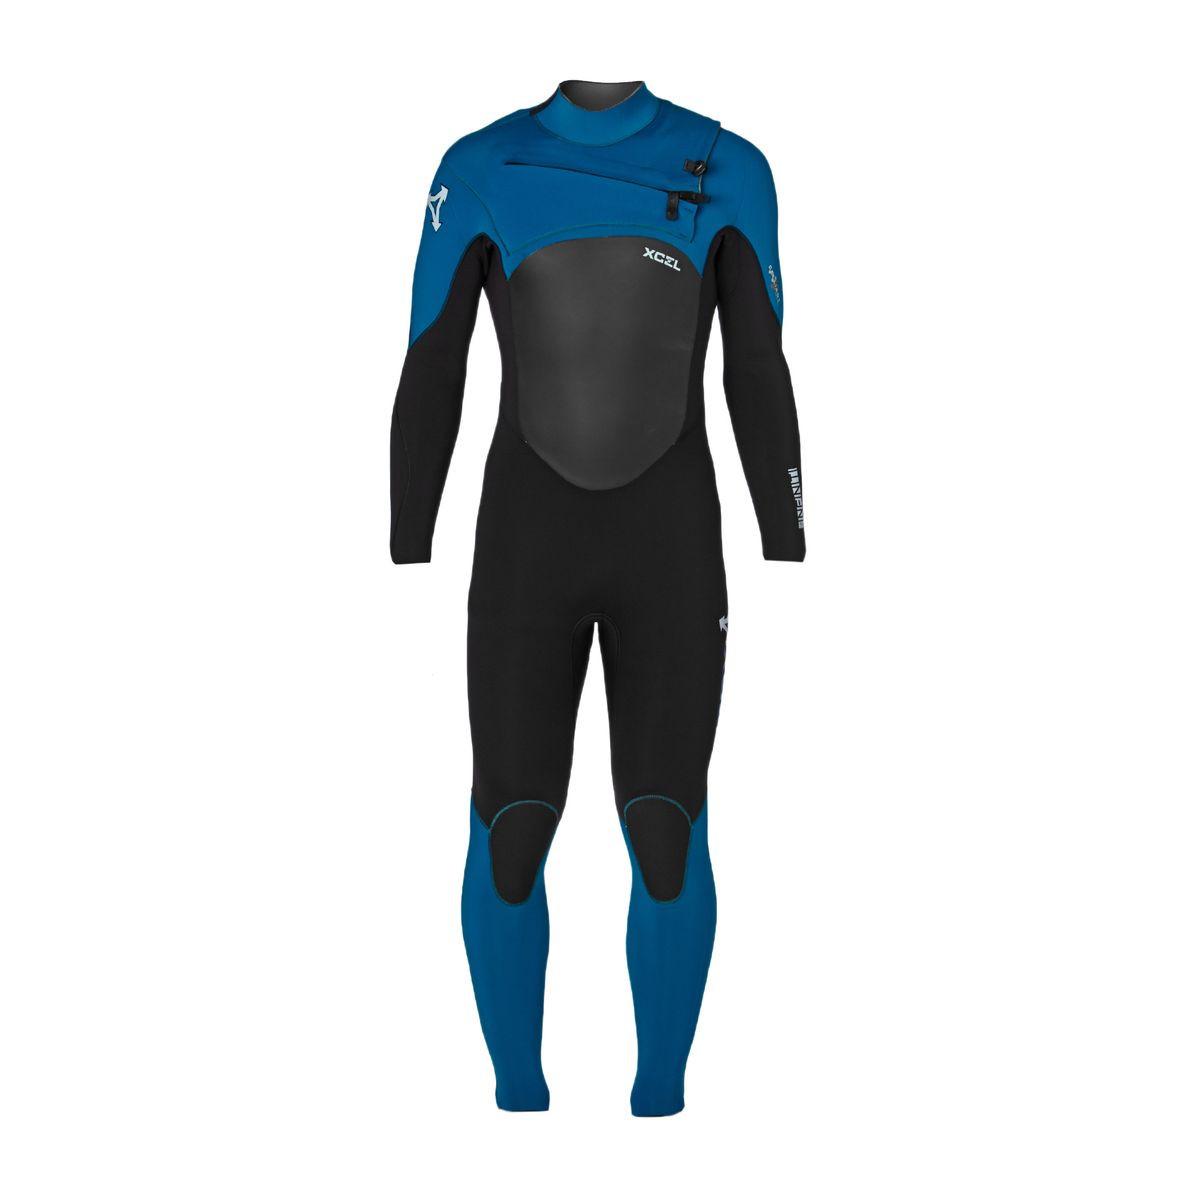 Xcel Infiniti 5/4/3mm X2 2017 Chest Zip Wetsuit - Black/ Nautical